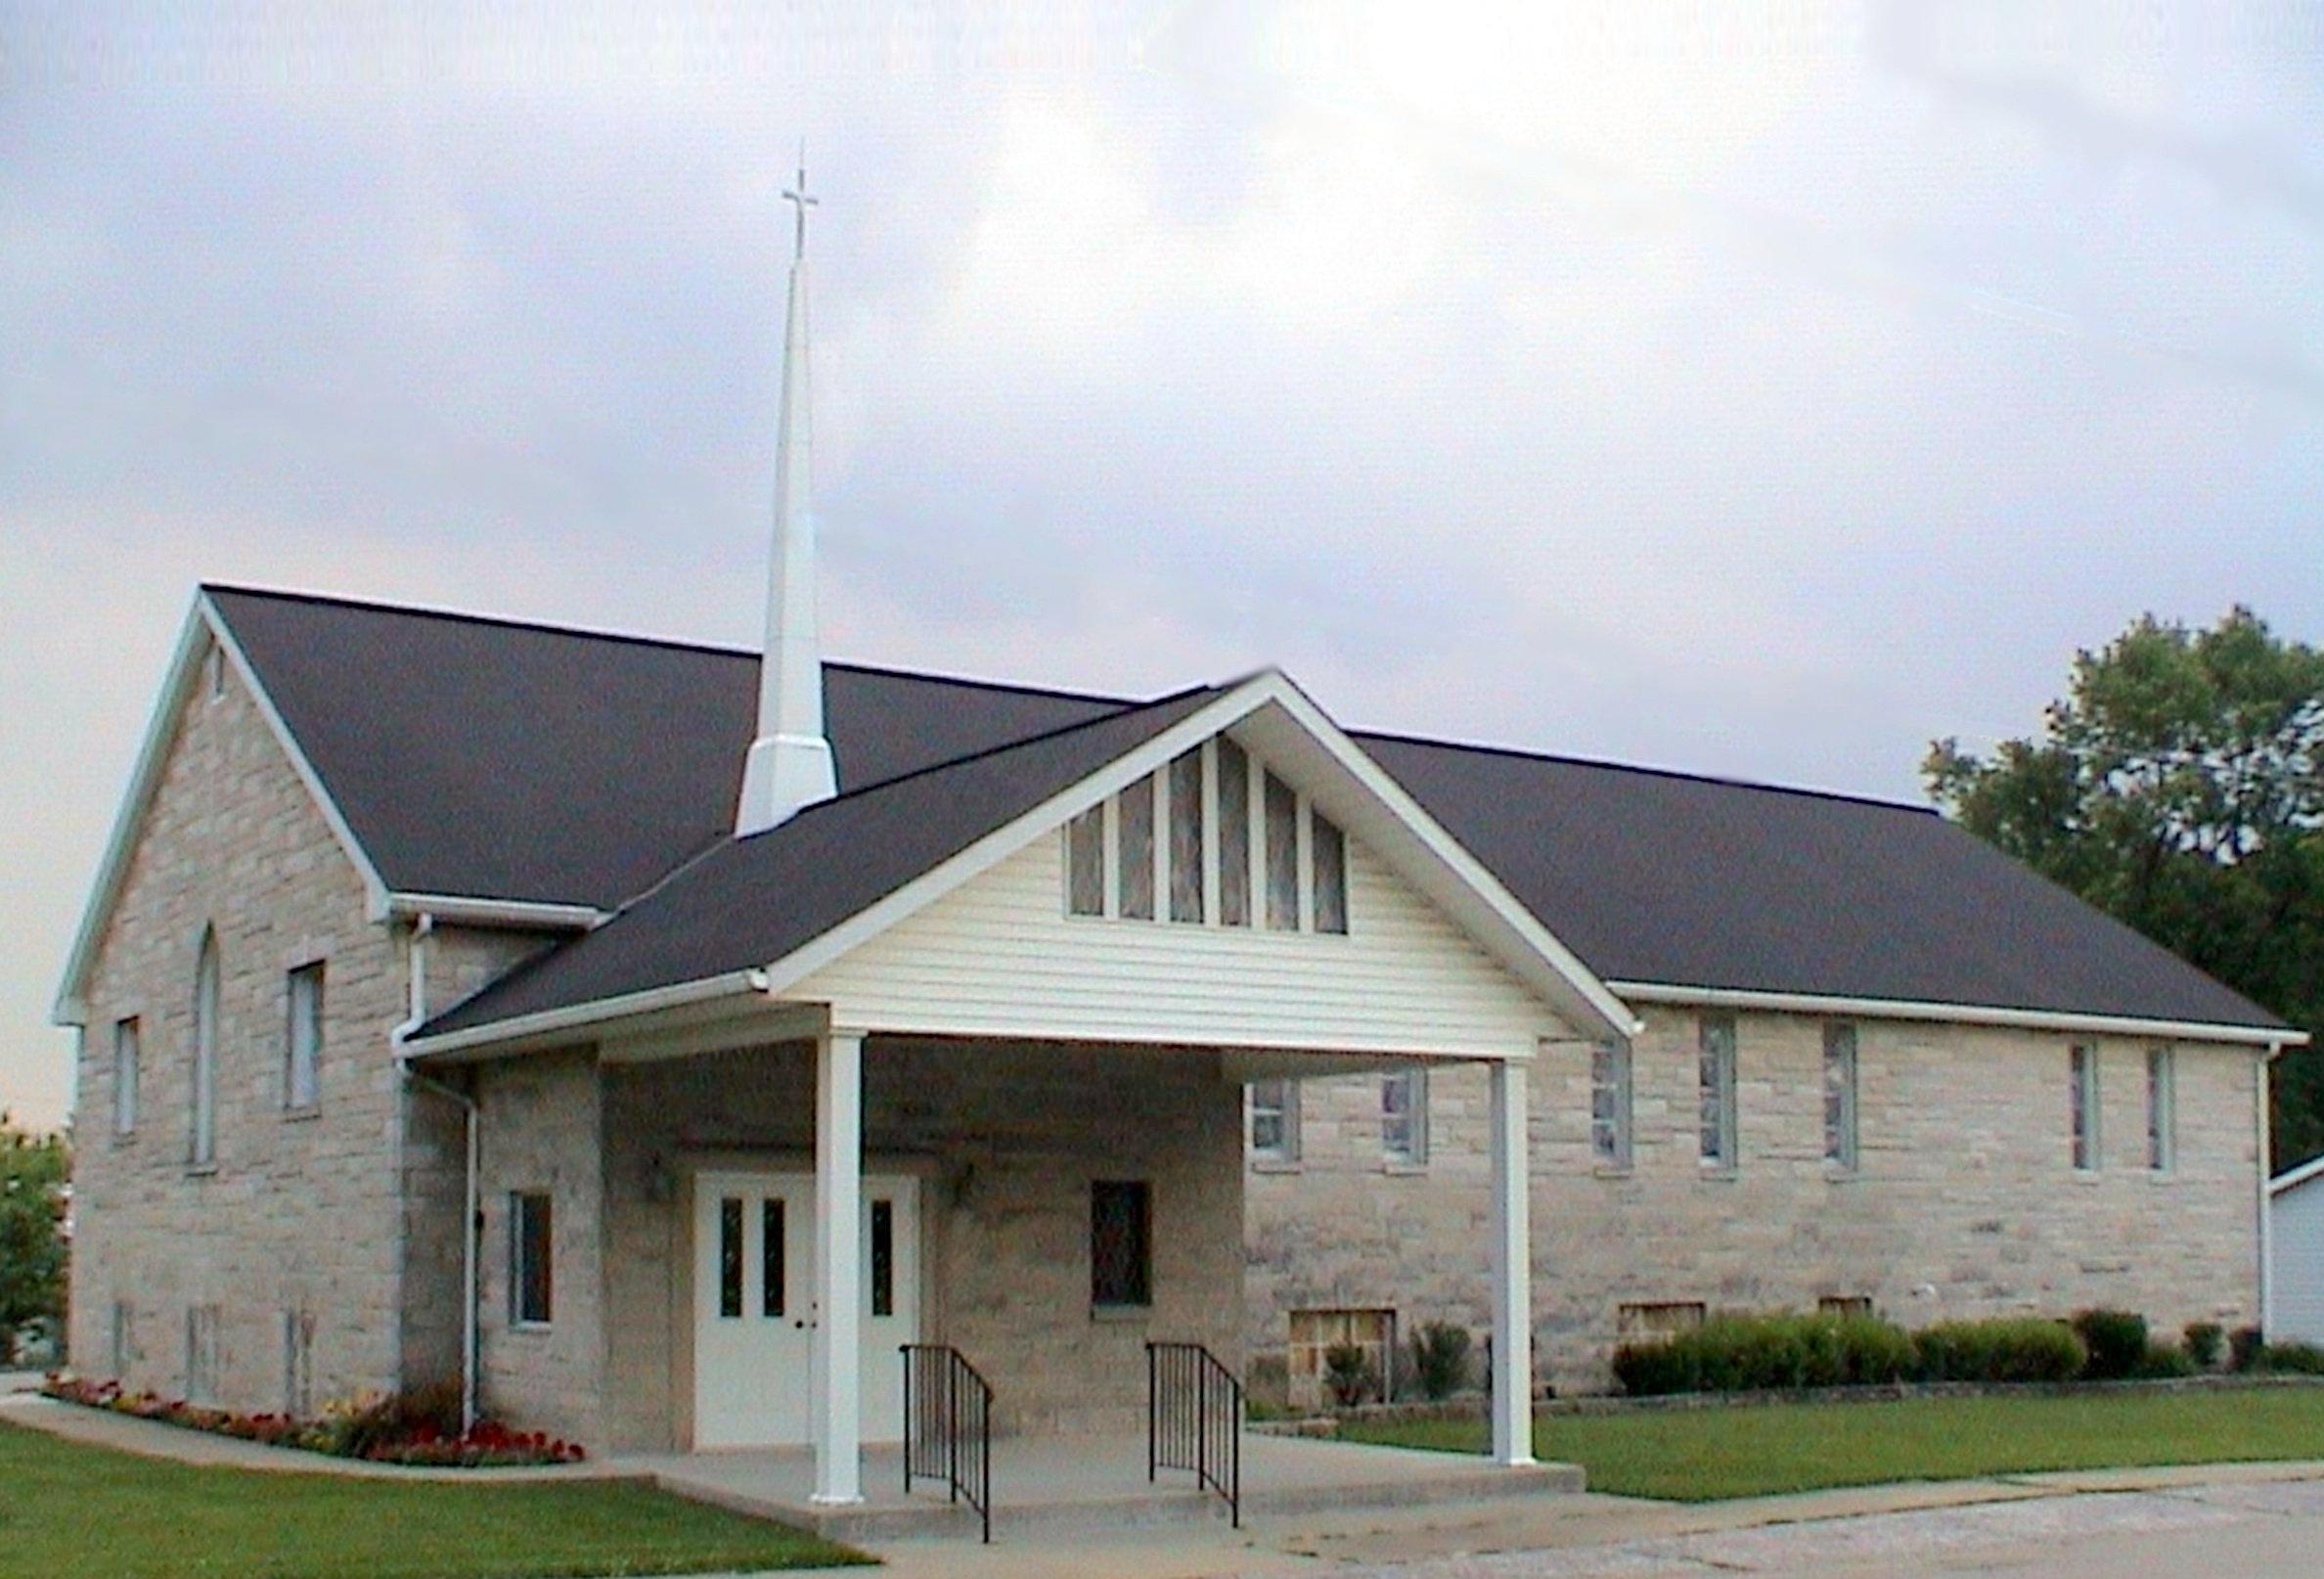 Restoration(Organized 1949) - Pastor: Rev. Ken Bushey (Email: pastorken@restorationnaz.church; 812-583-1542)Location: 504 19th St., Bedford, IN 47421Church Phone: (812) 279-1840Website: www.restorationnaz.church